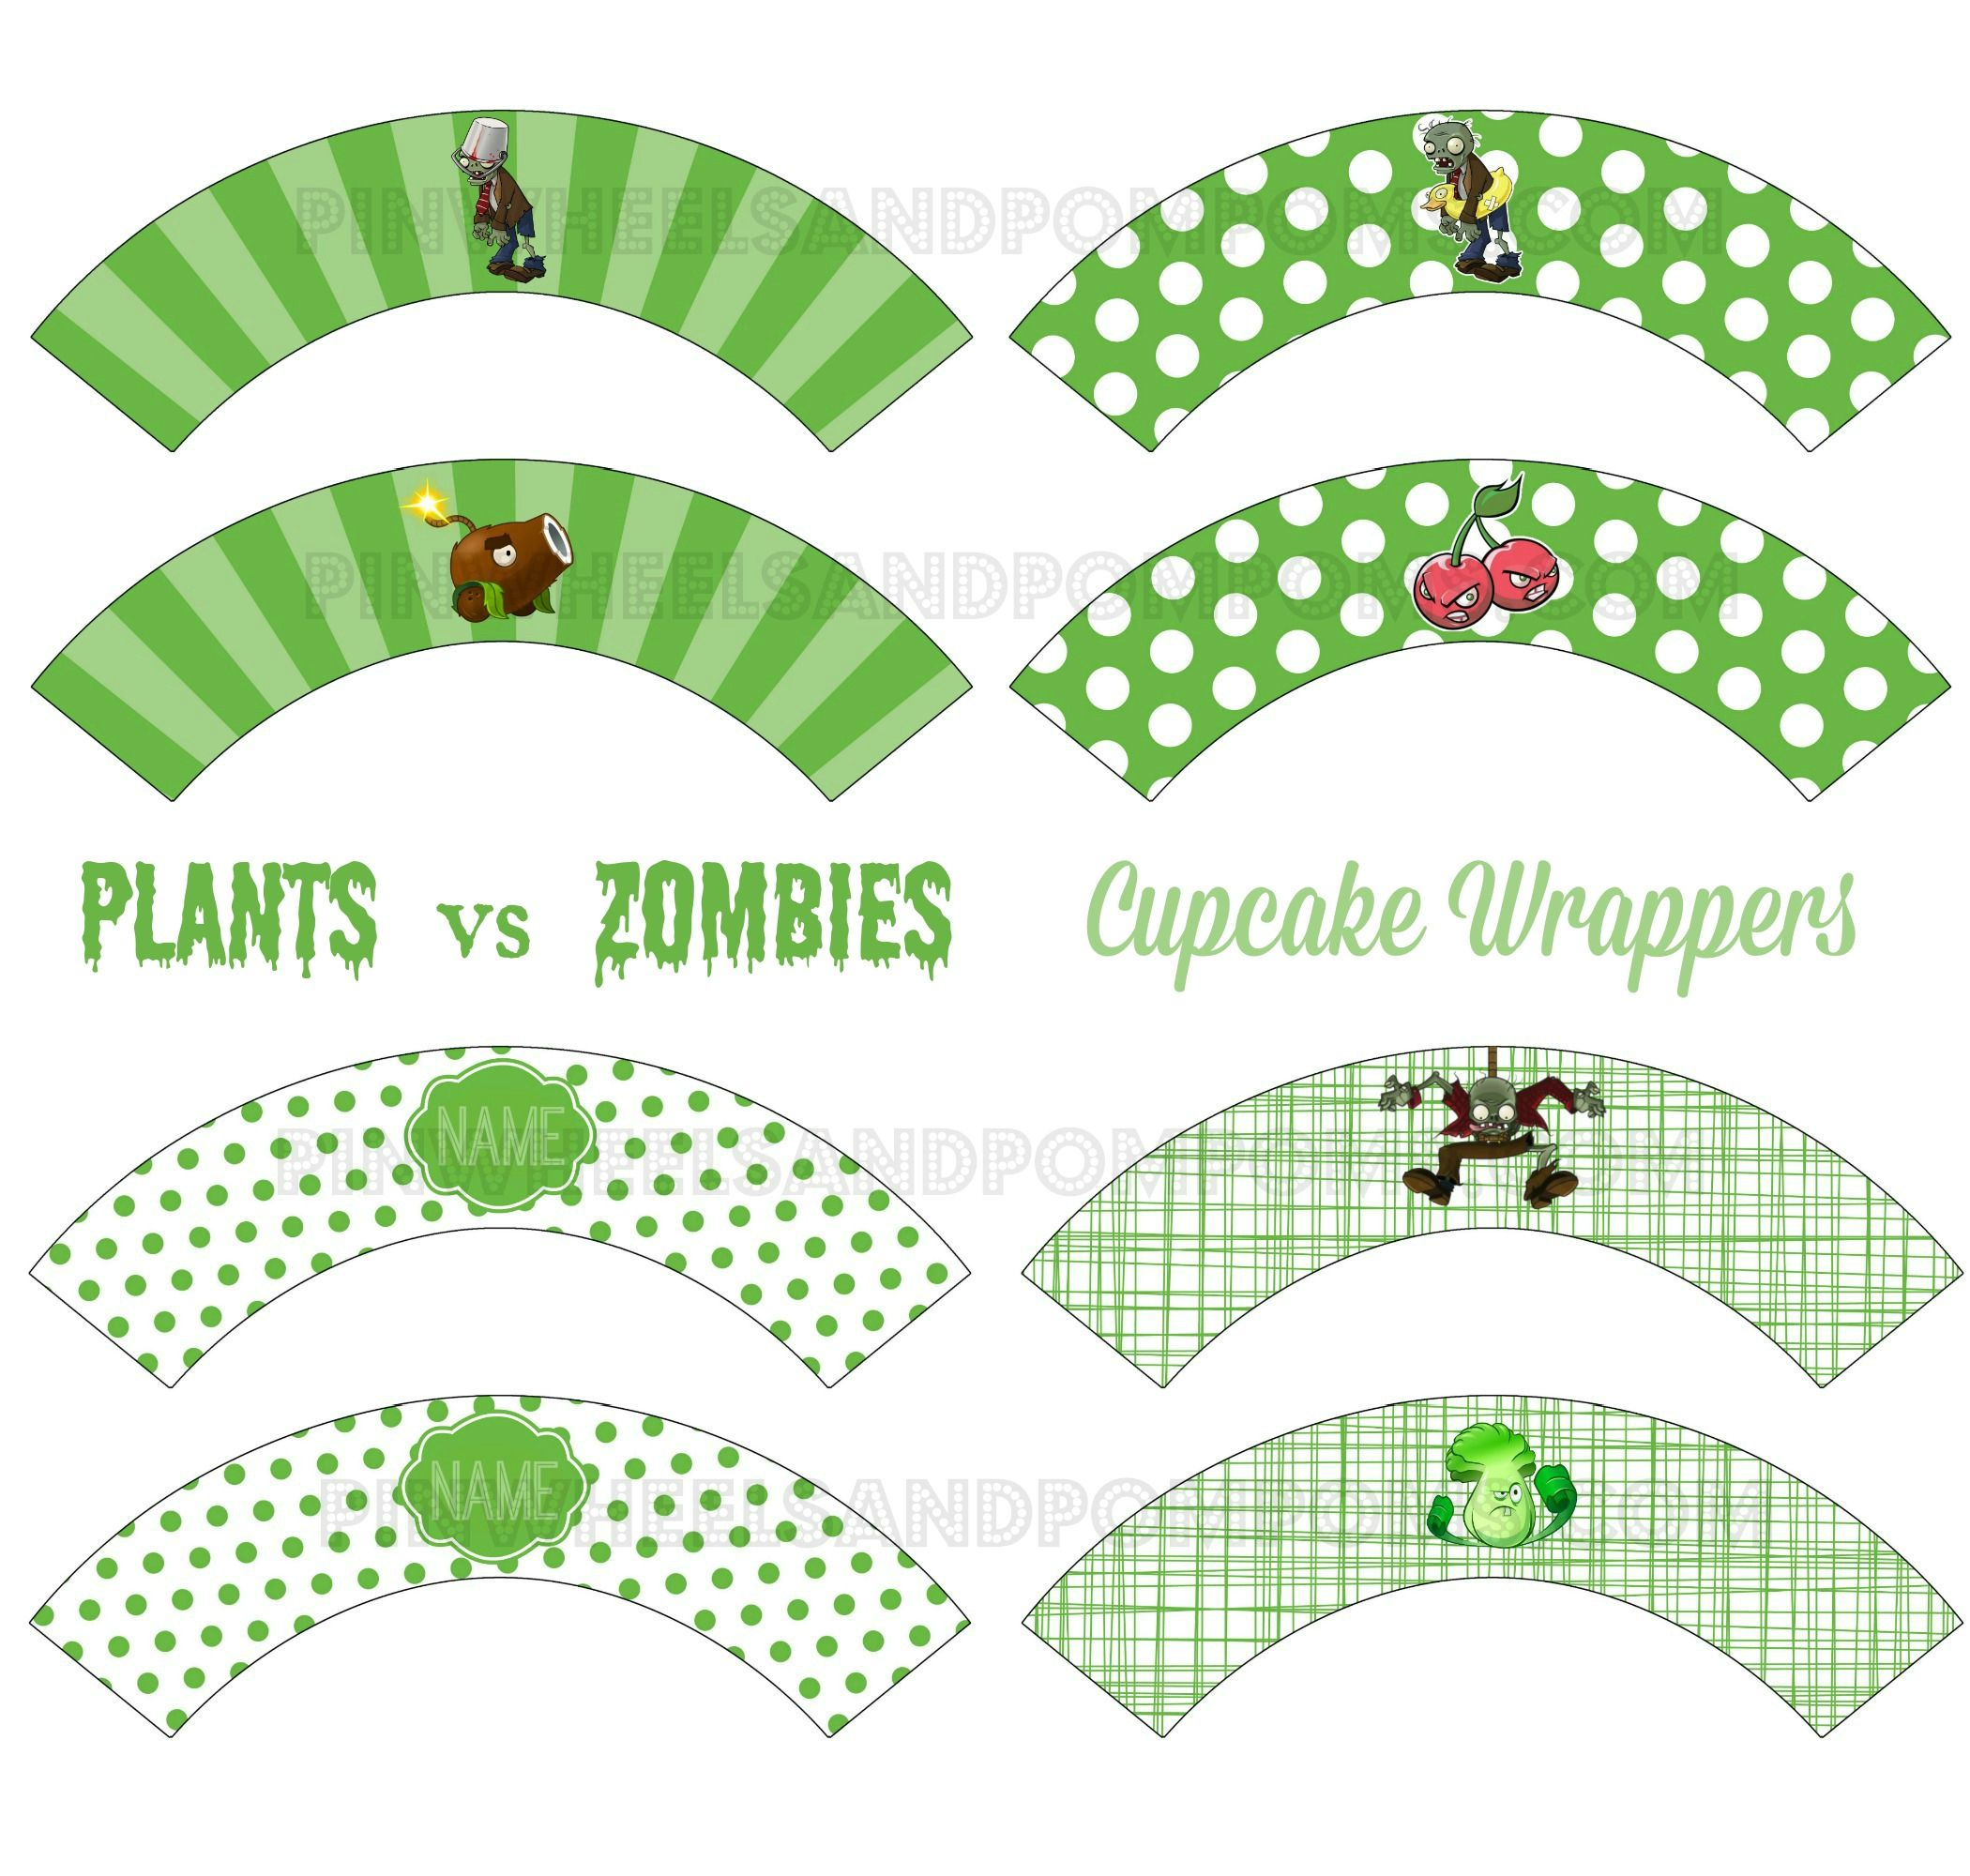 Cupcake Wrappers Plants Vs Zombies Plants Vs Zombies Plantas